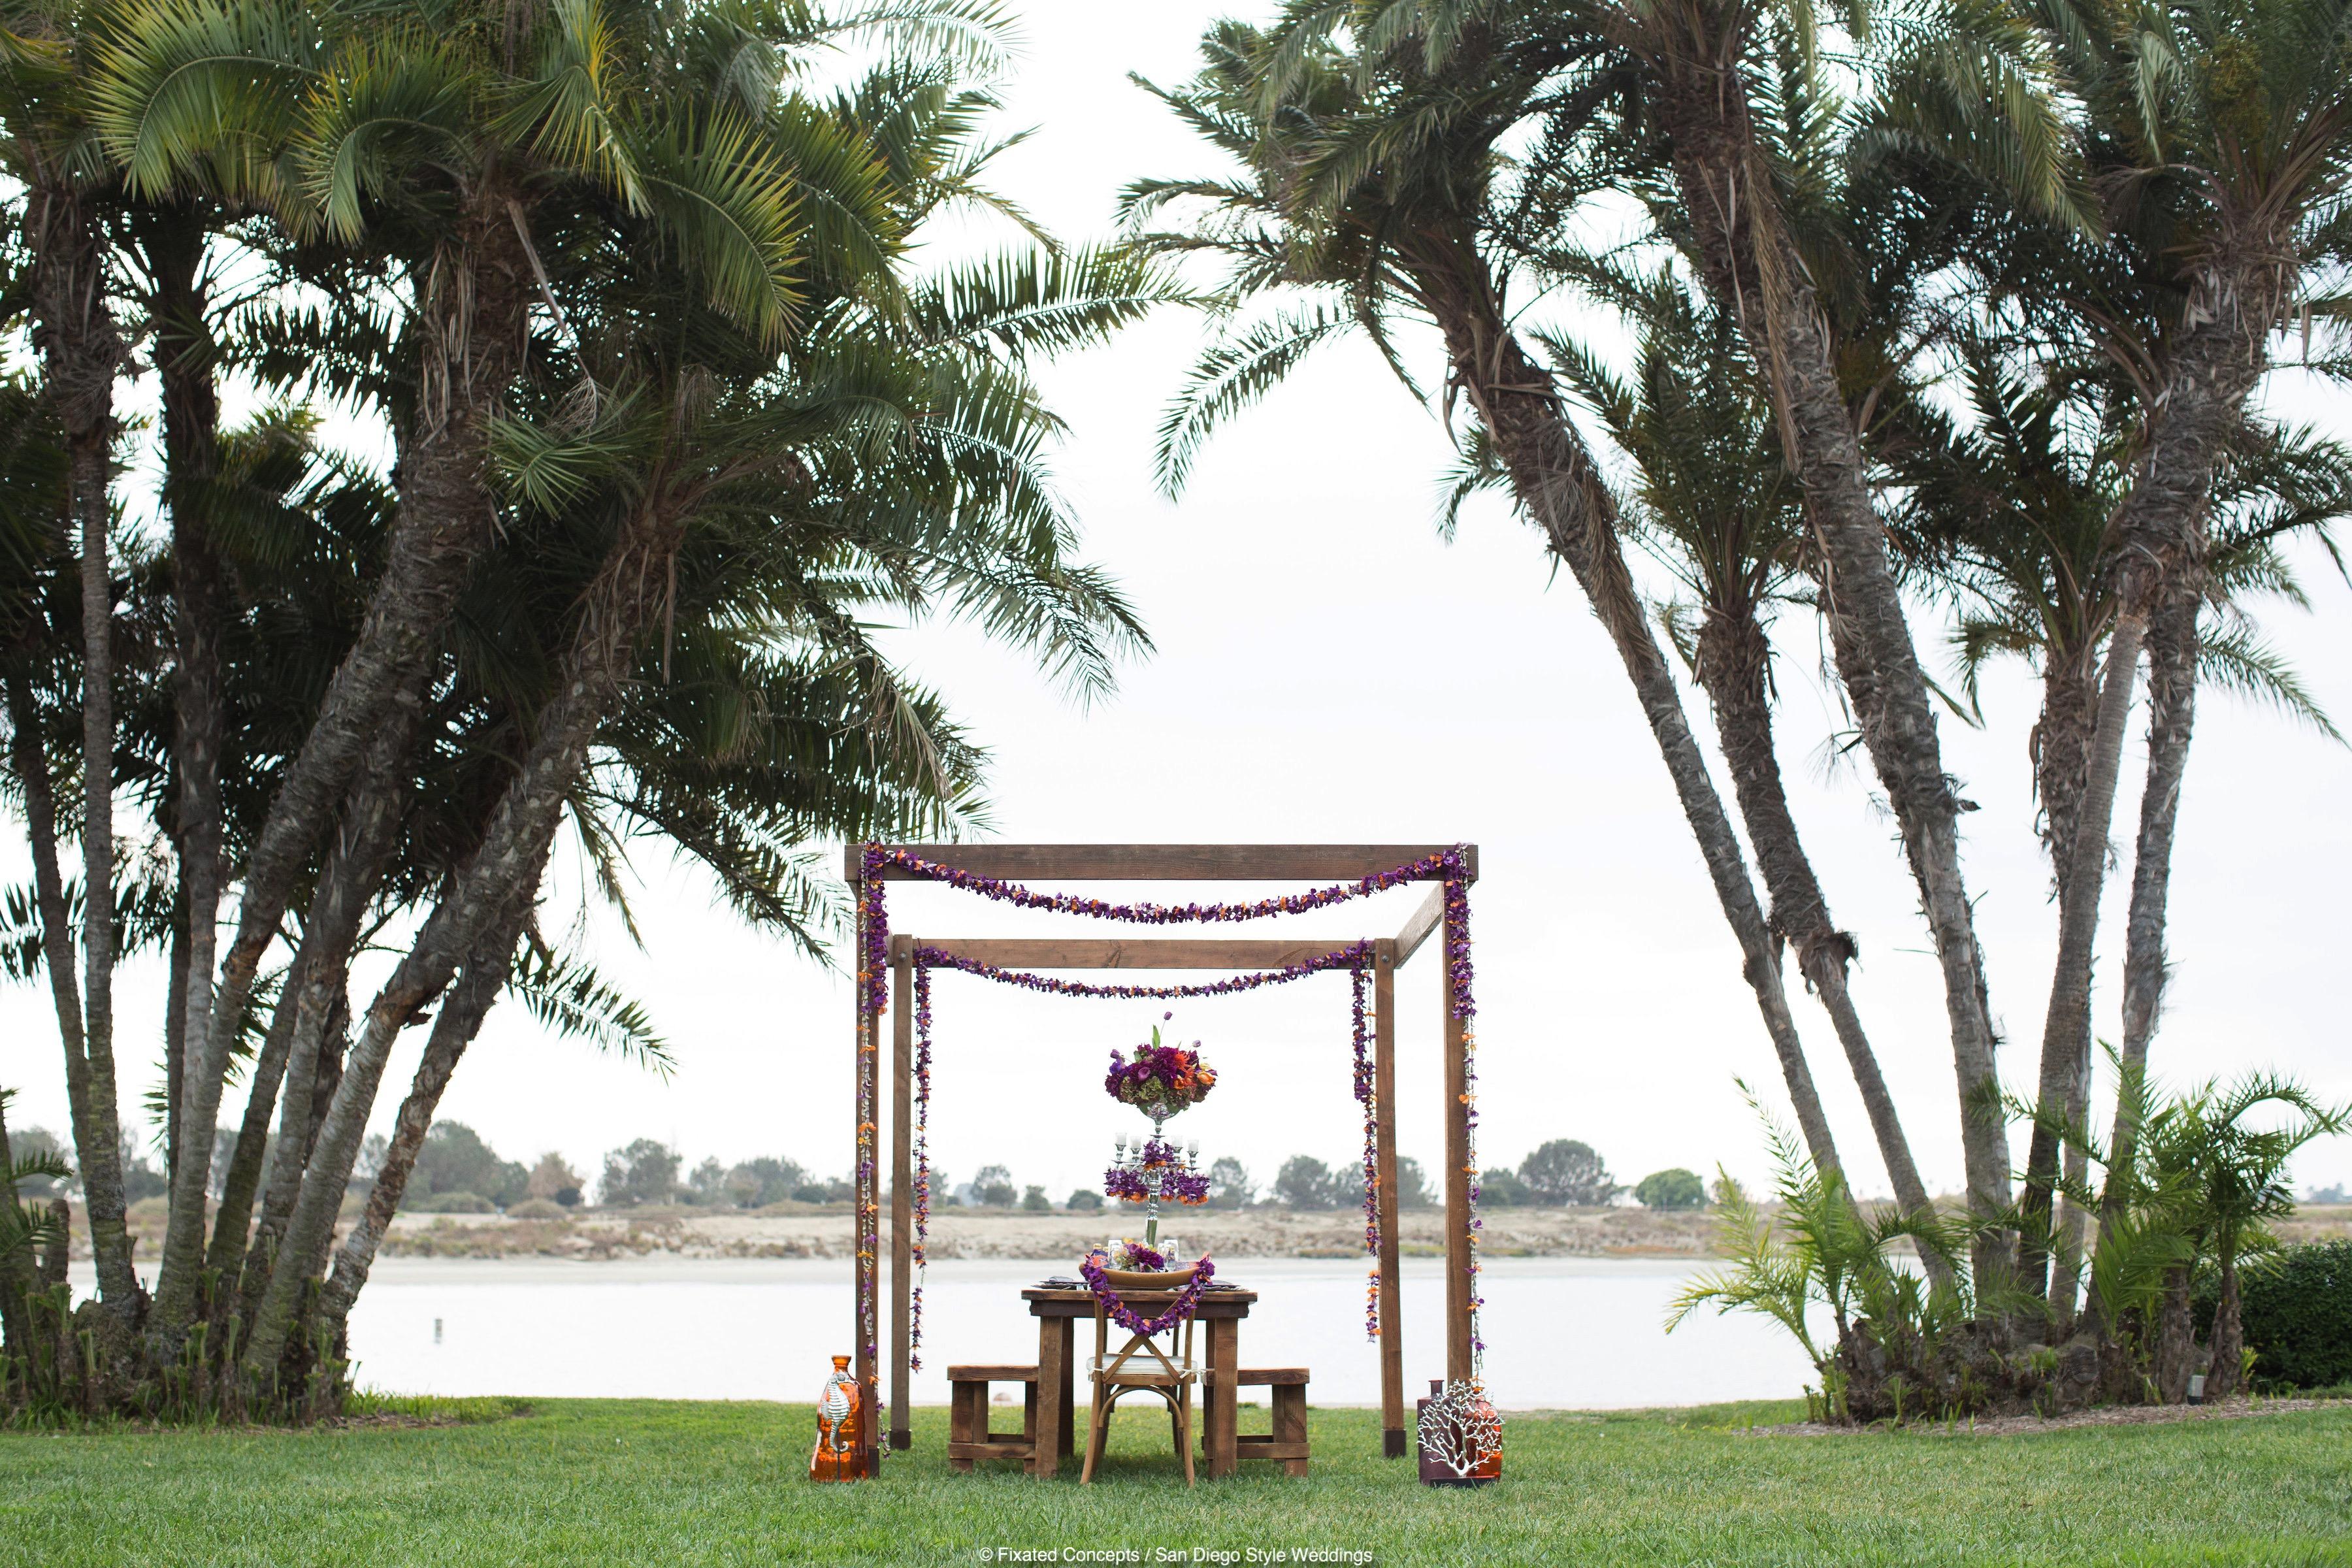 Elegant Beach Tablescape Photo Shoot for San Diego Style Weddings